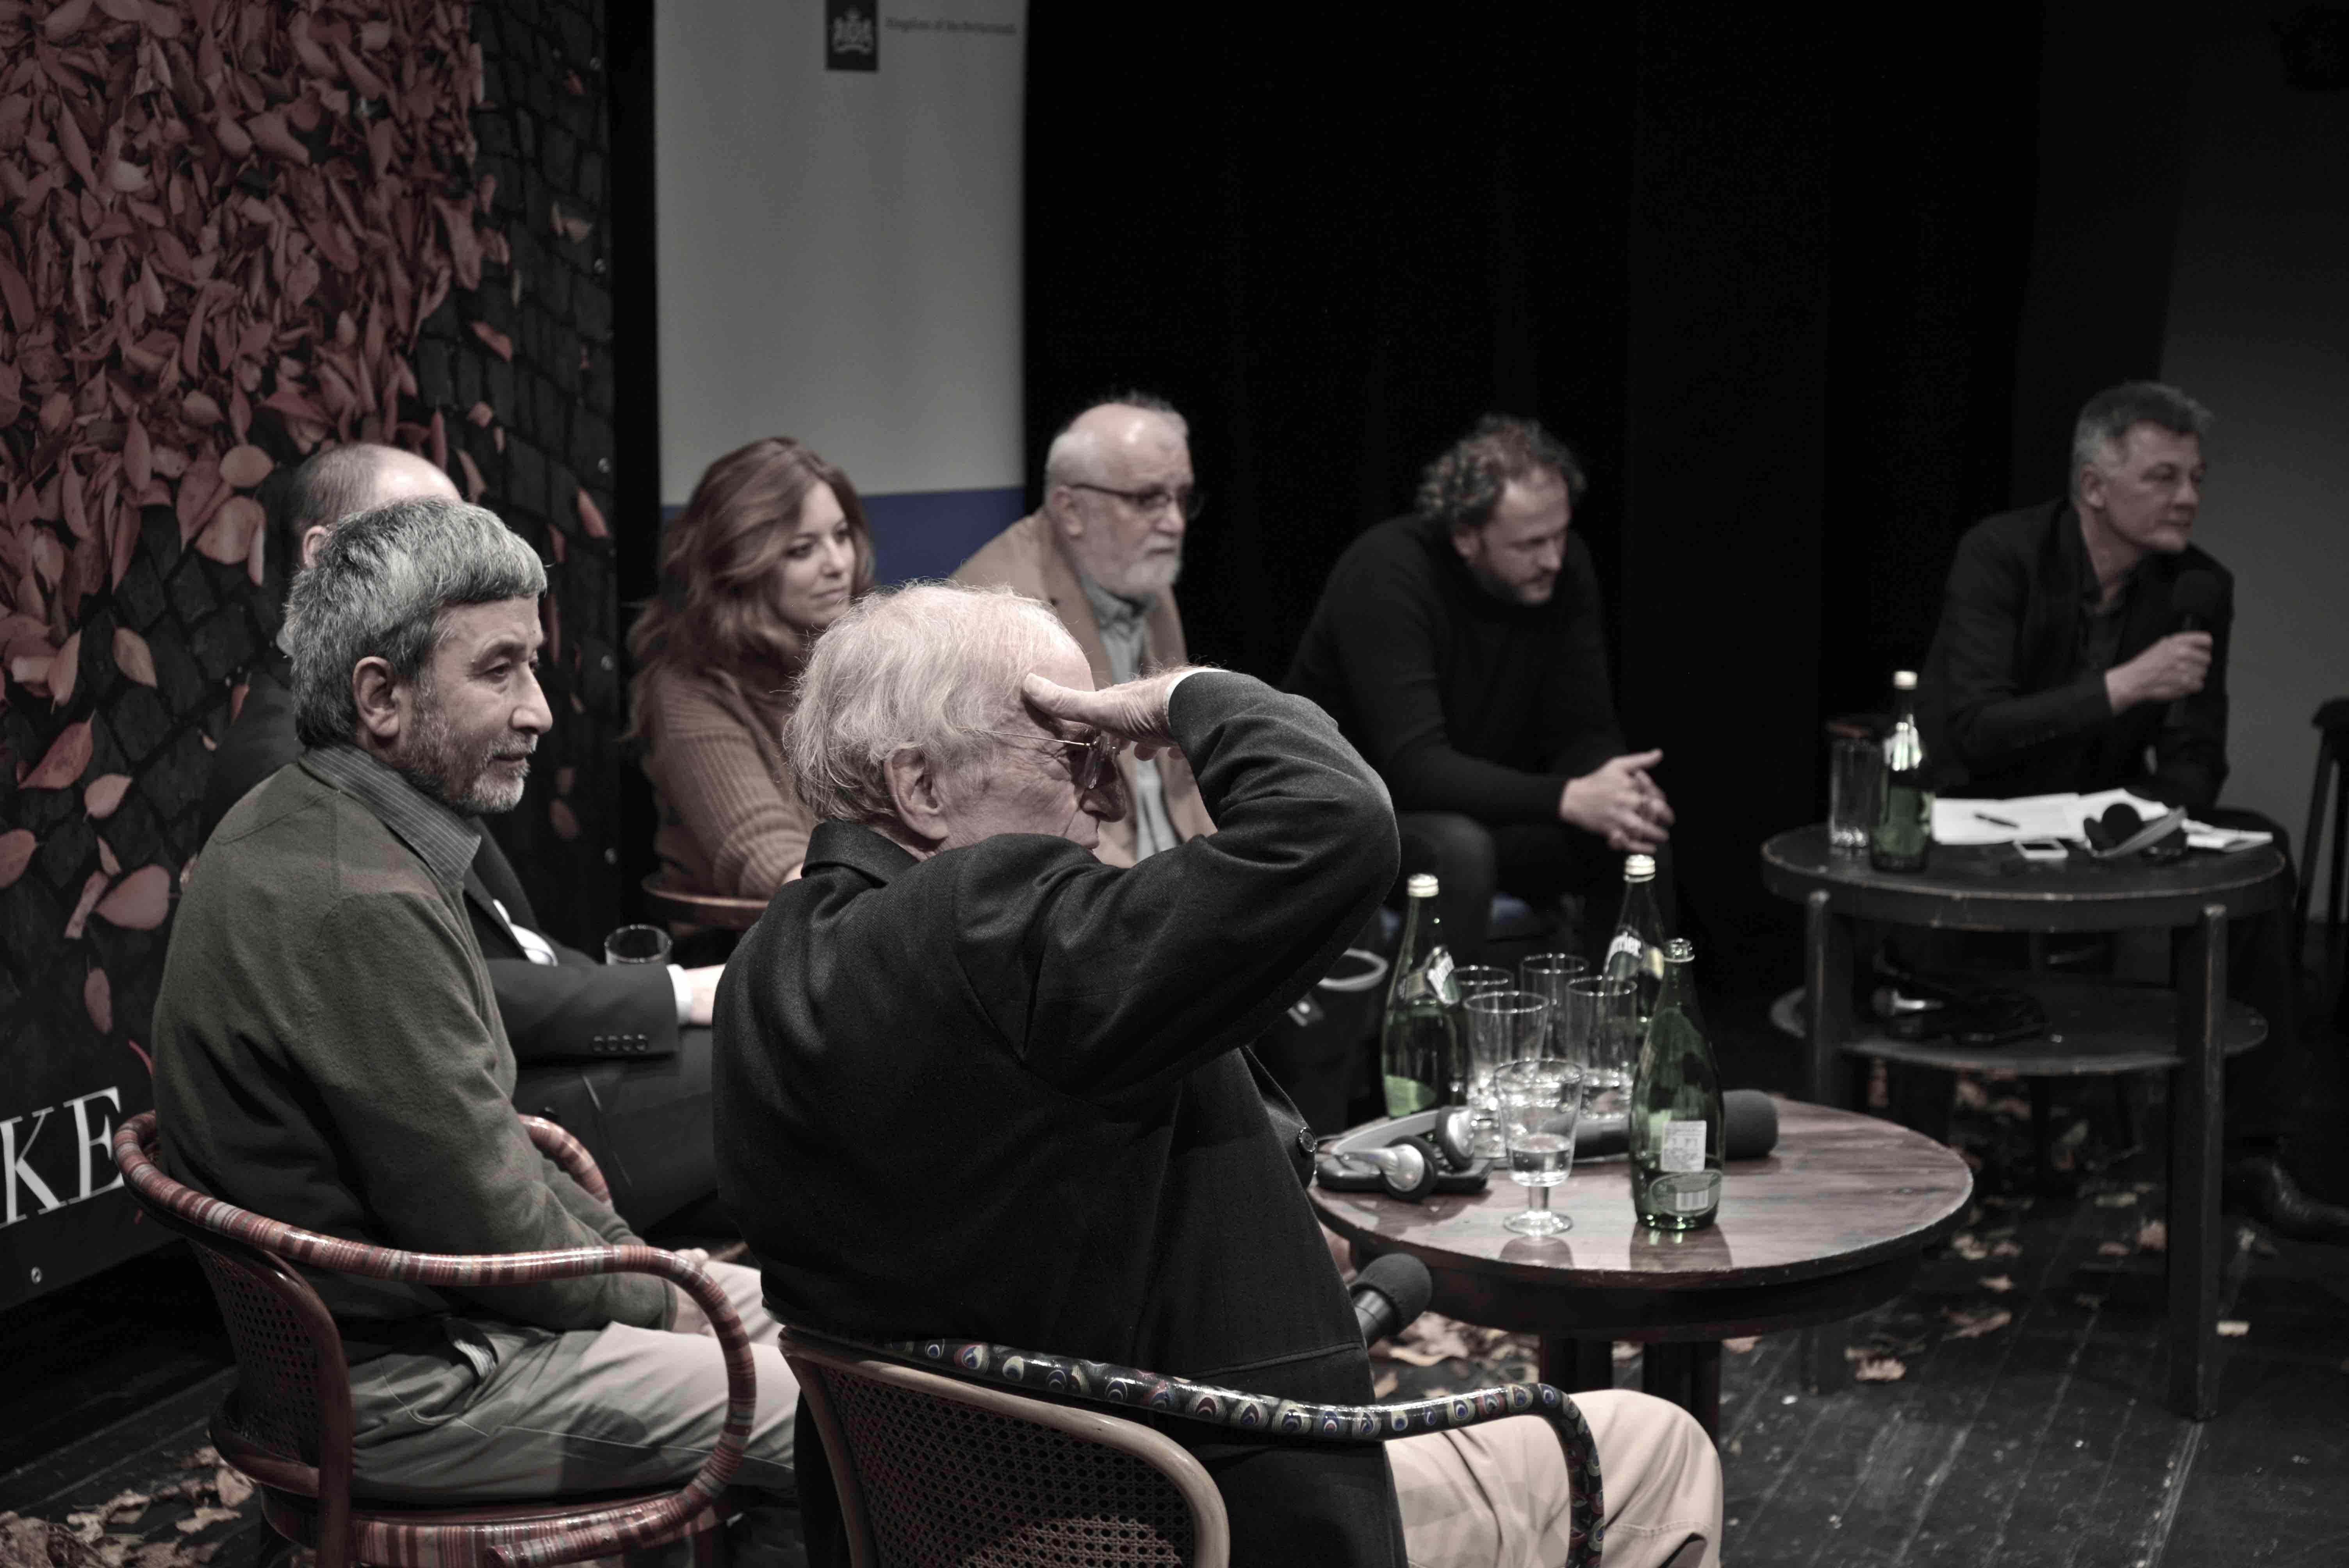 Avishai Margalit - Hamid Ismailov - Keith Lowe - Rasha Khayat - Hars Pašović - Michal Havran - Chris Keulemans